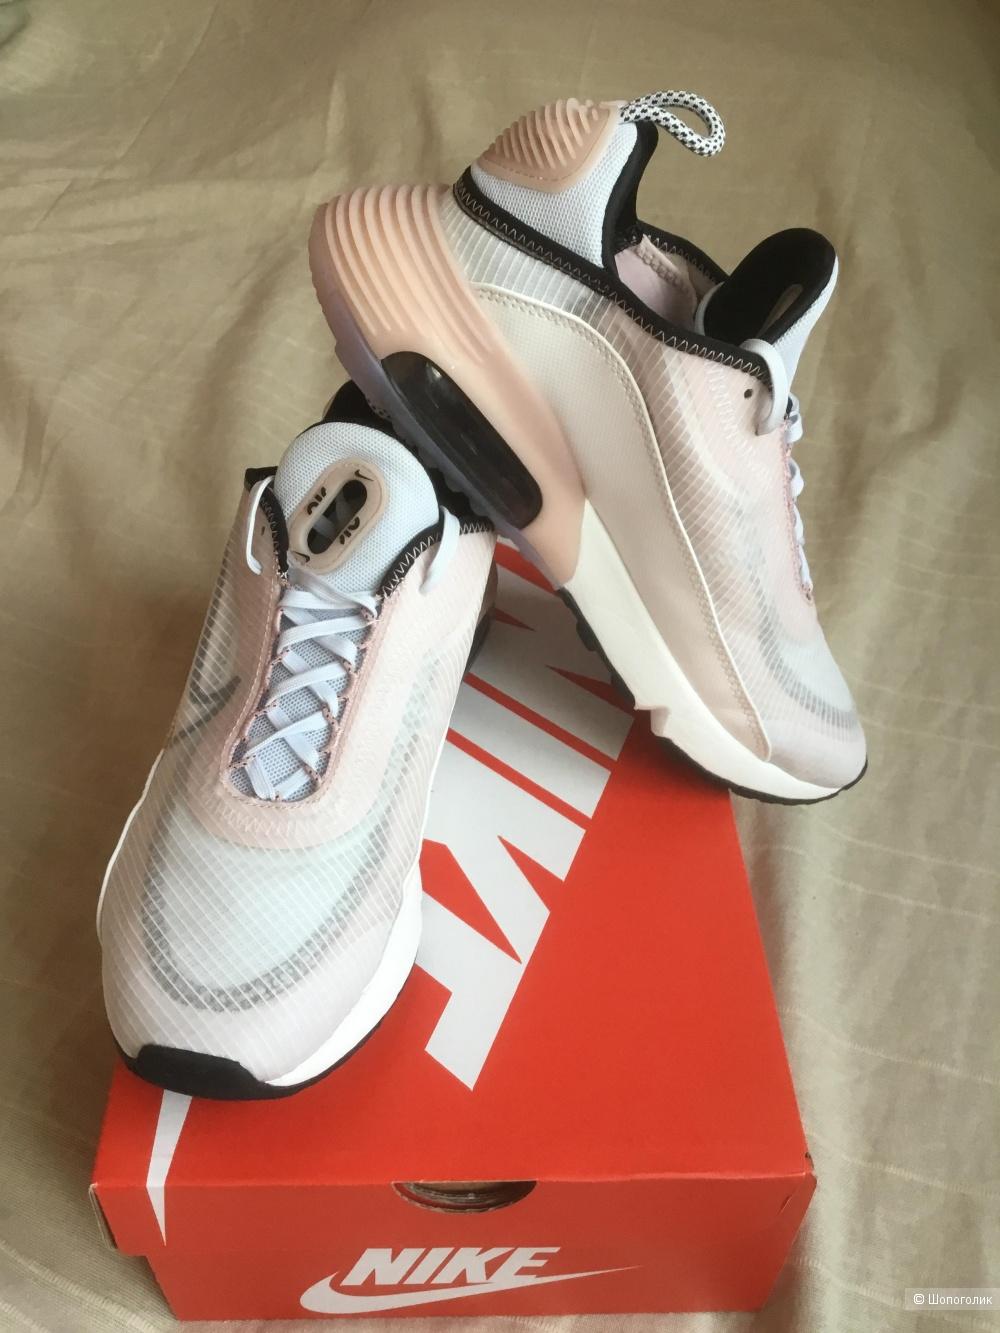 Кроссовки Nike air max 2090, размер 8,5